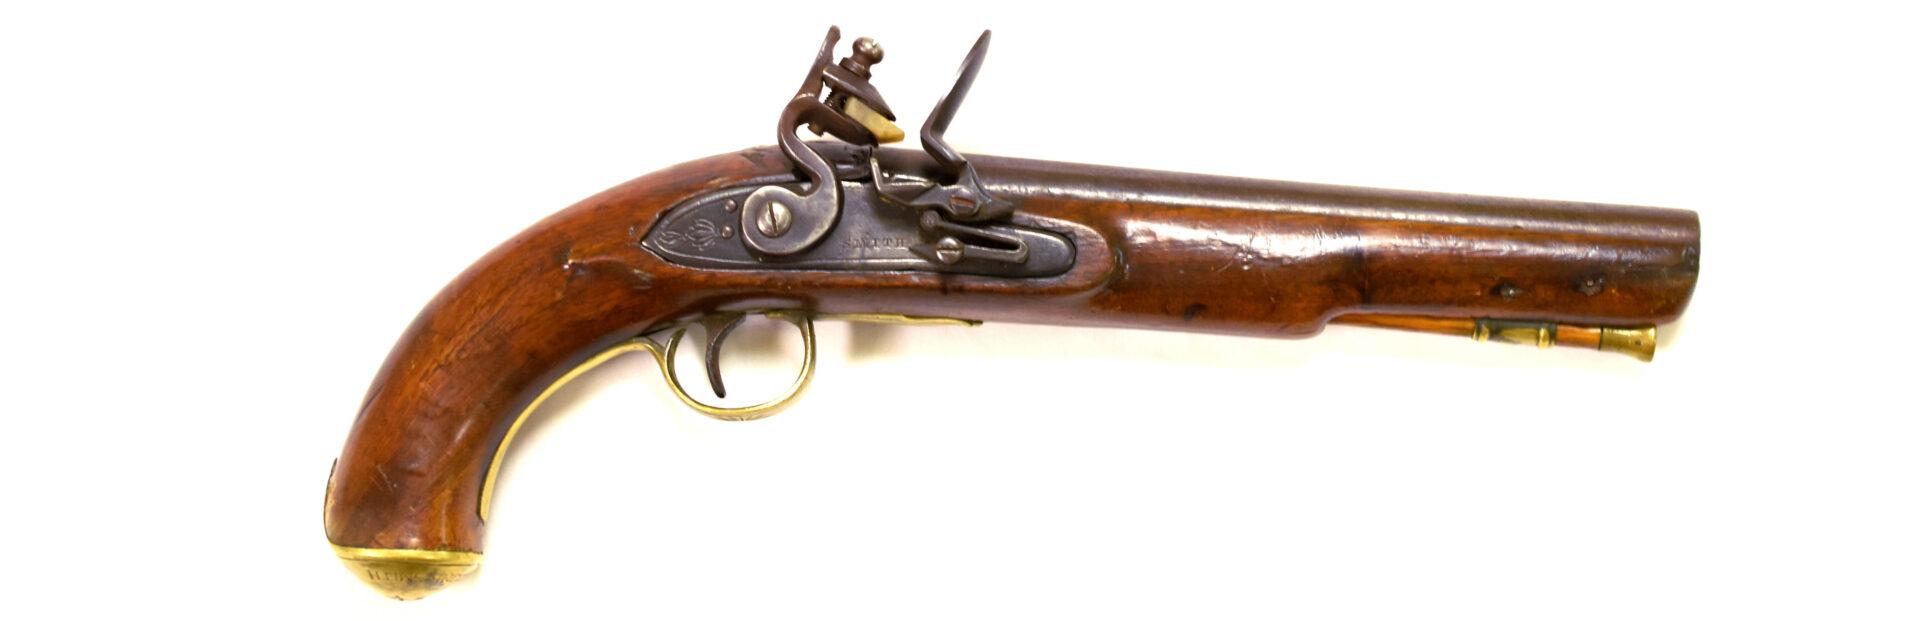 mountain man guns